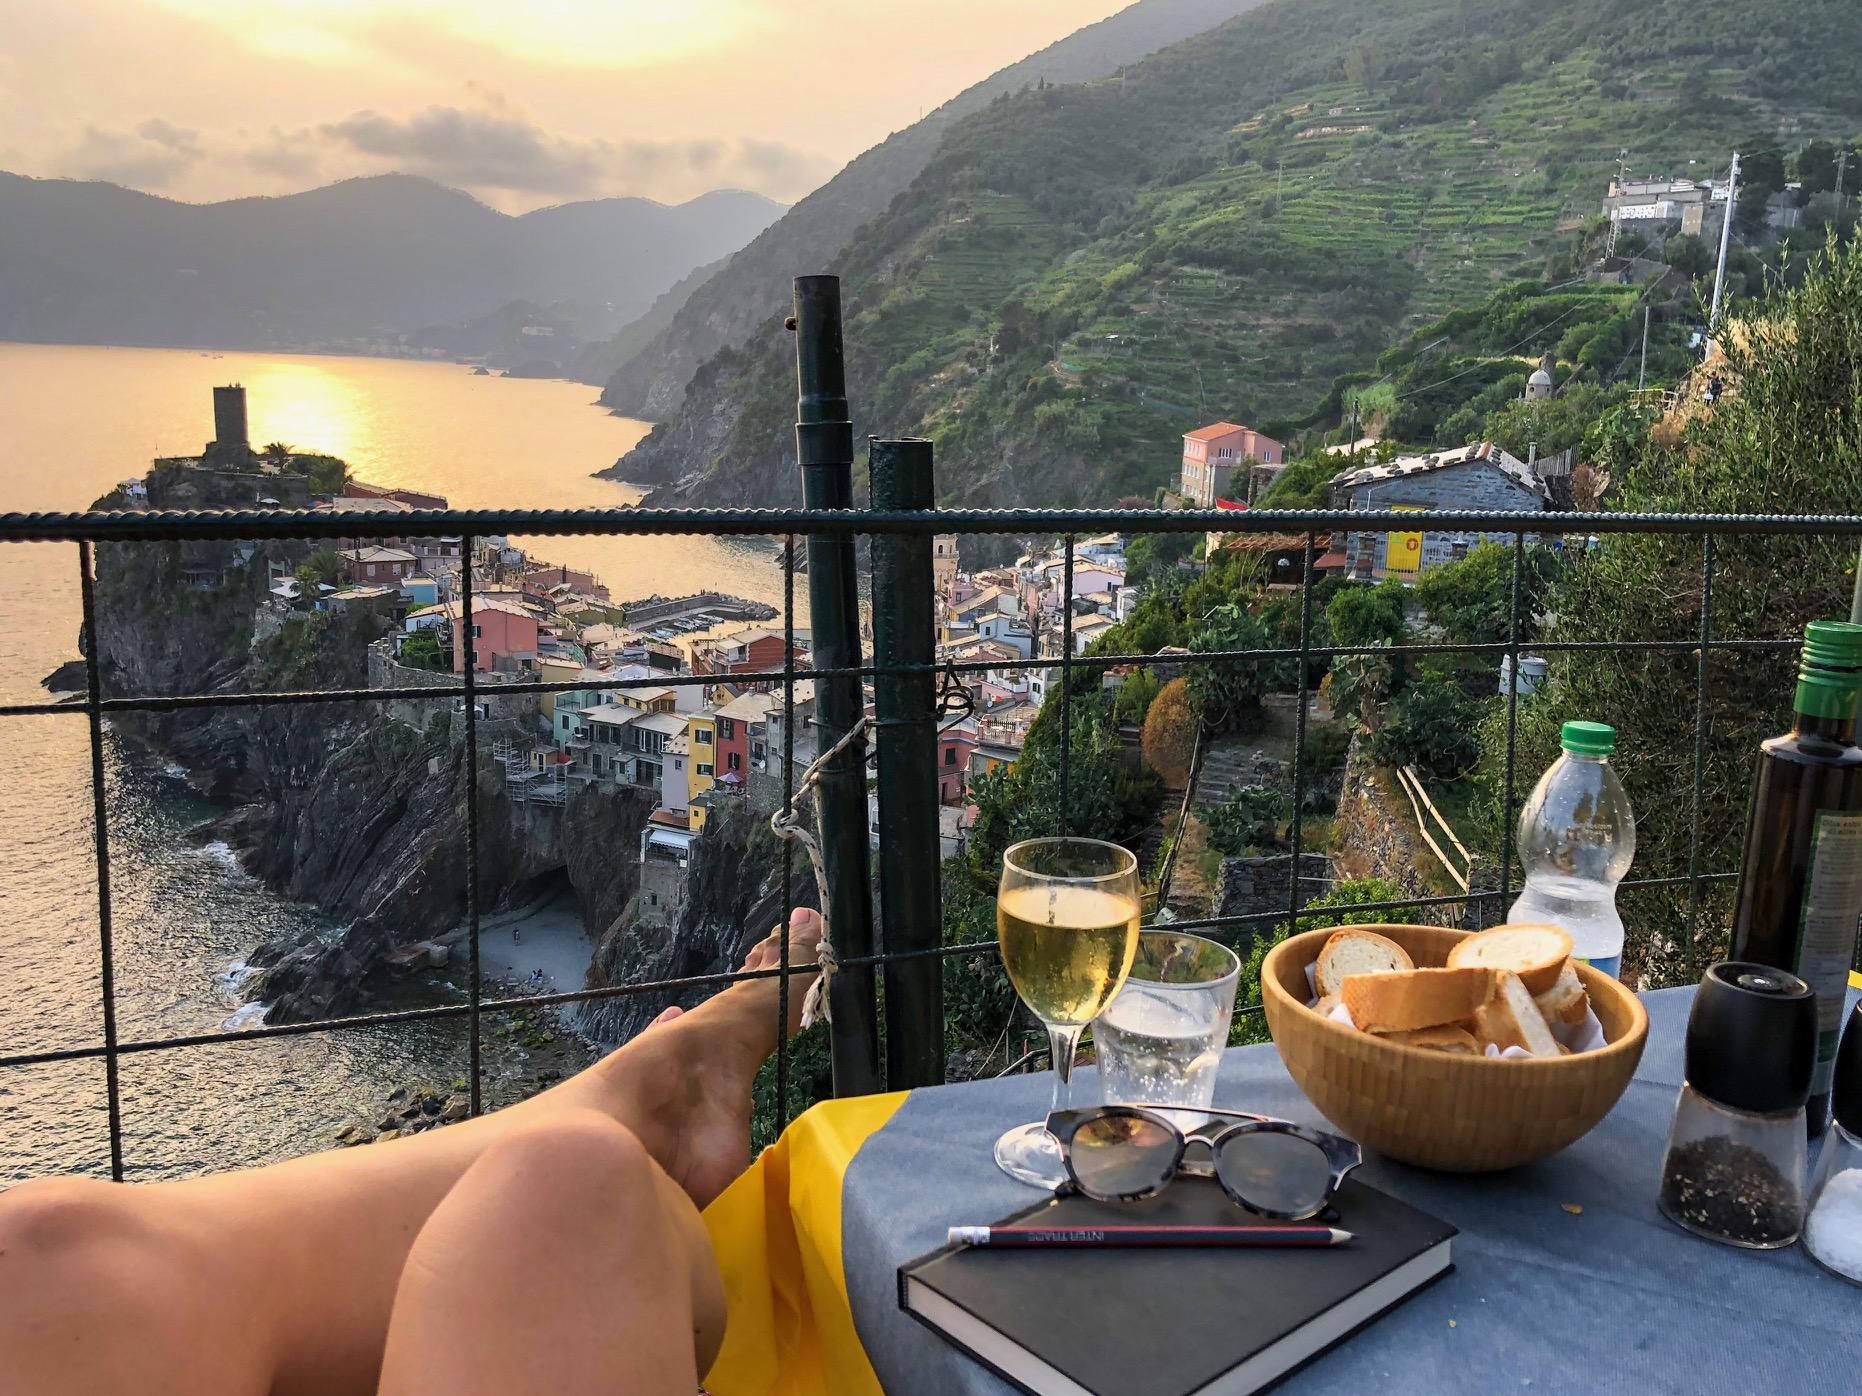 De mooiste terrassen in Cinque Terre, Italië